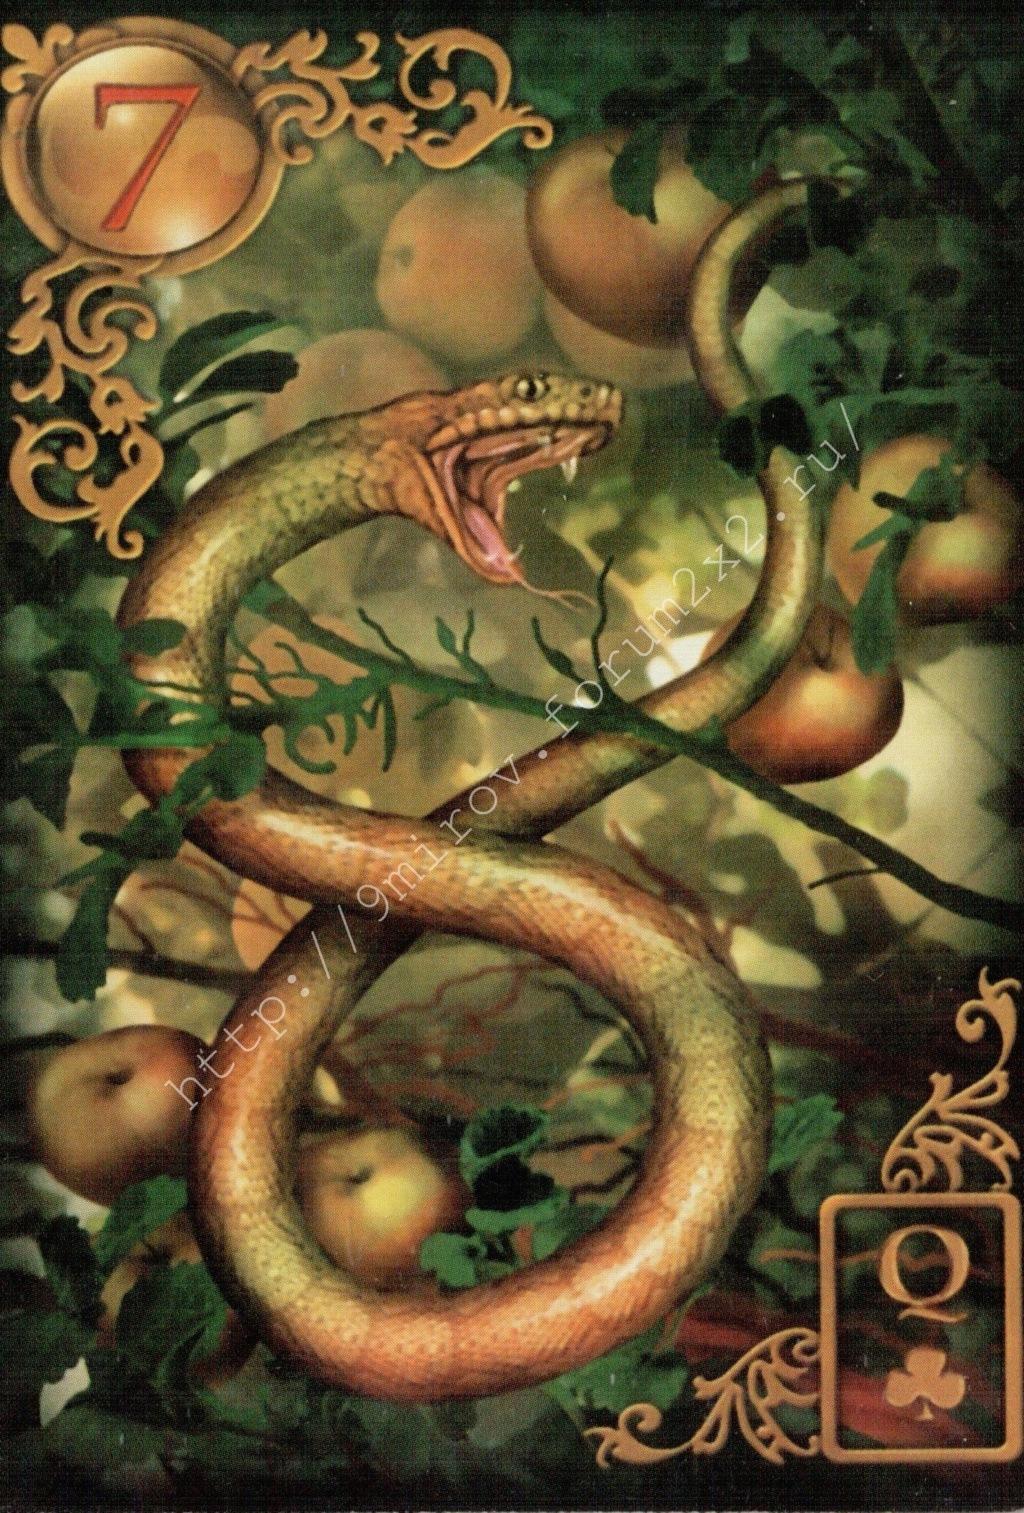 Золотые мечты Ленорман (Расширенное издание) | Gilded Reverie Lenormand. Галерея.  Water103